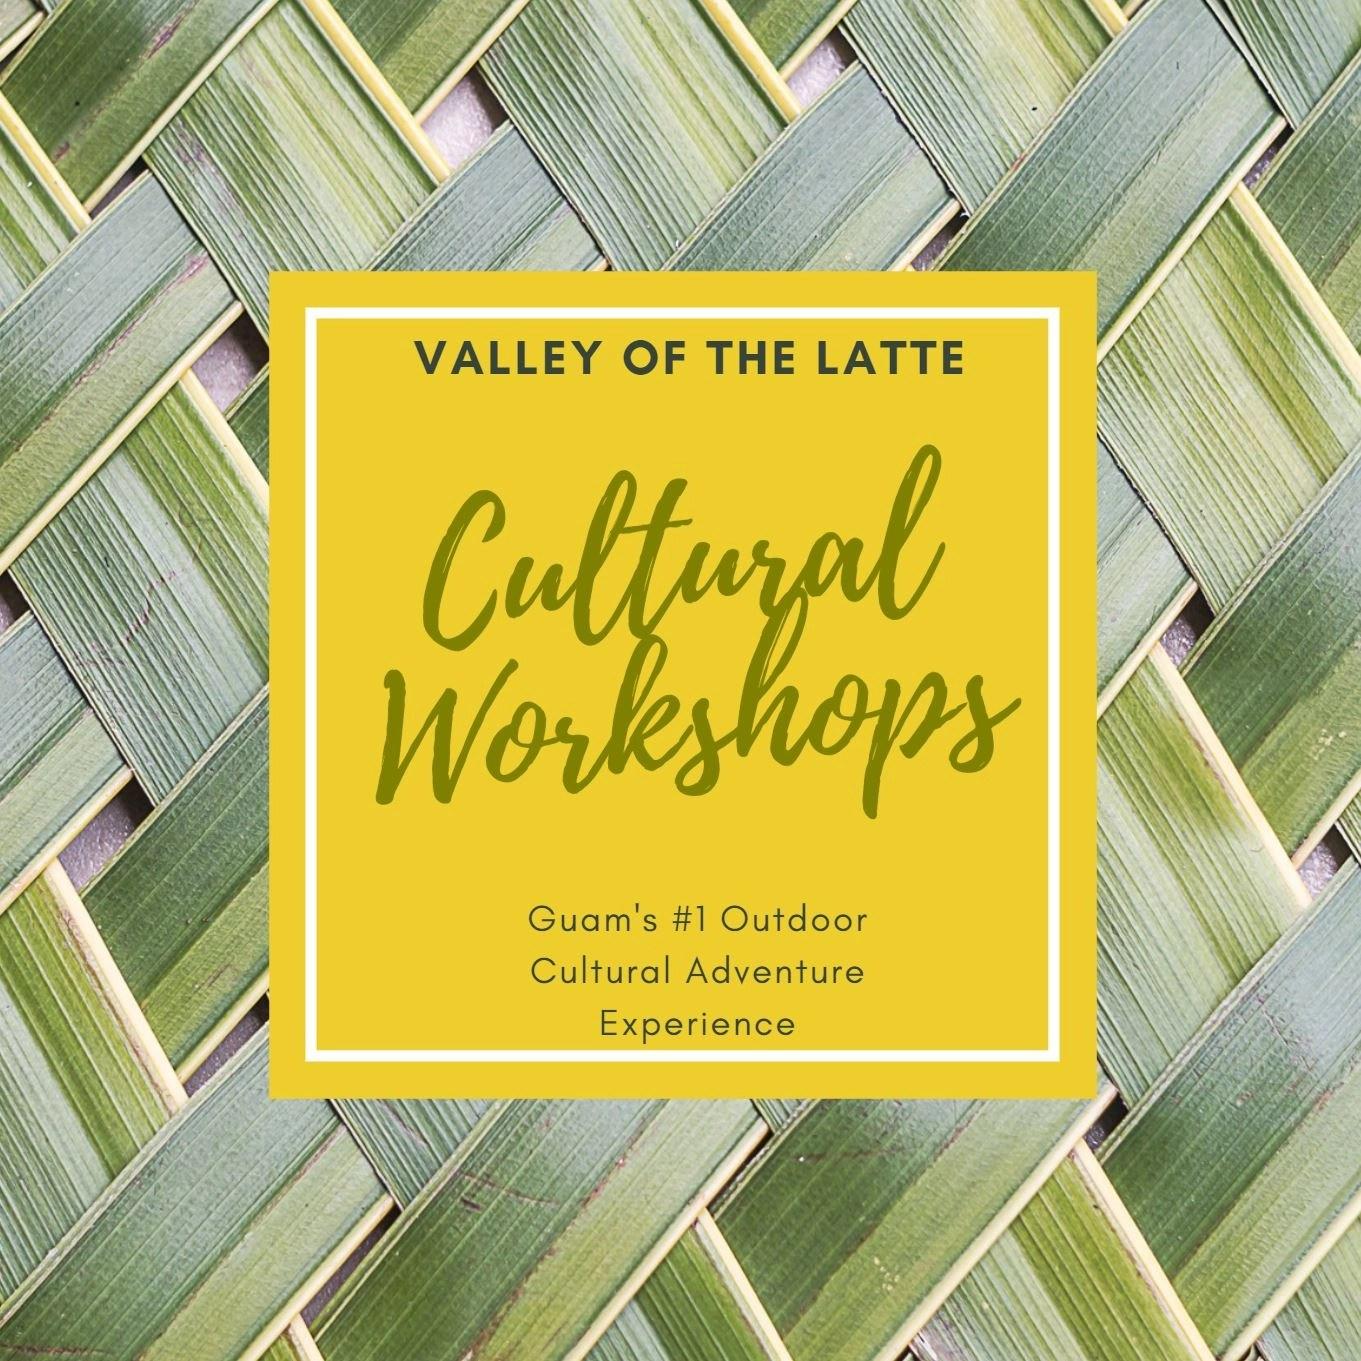 Guam's #1 Outdoor Cultural Adventure Experience Workshops